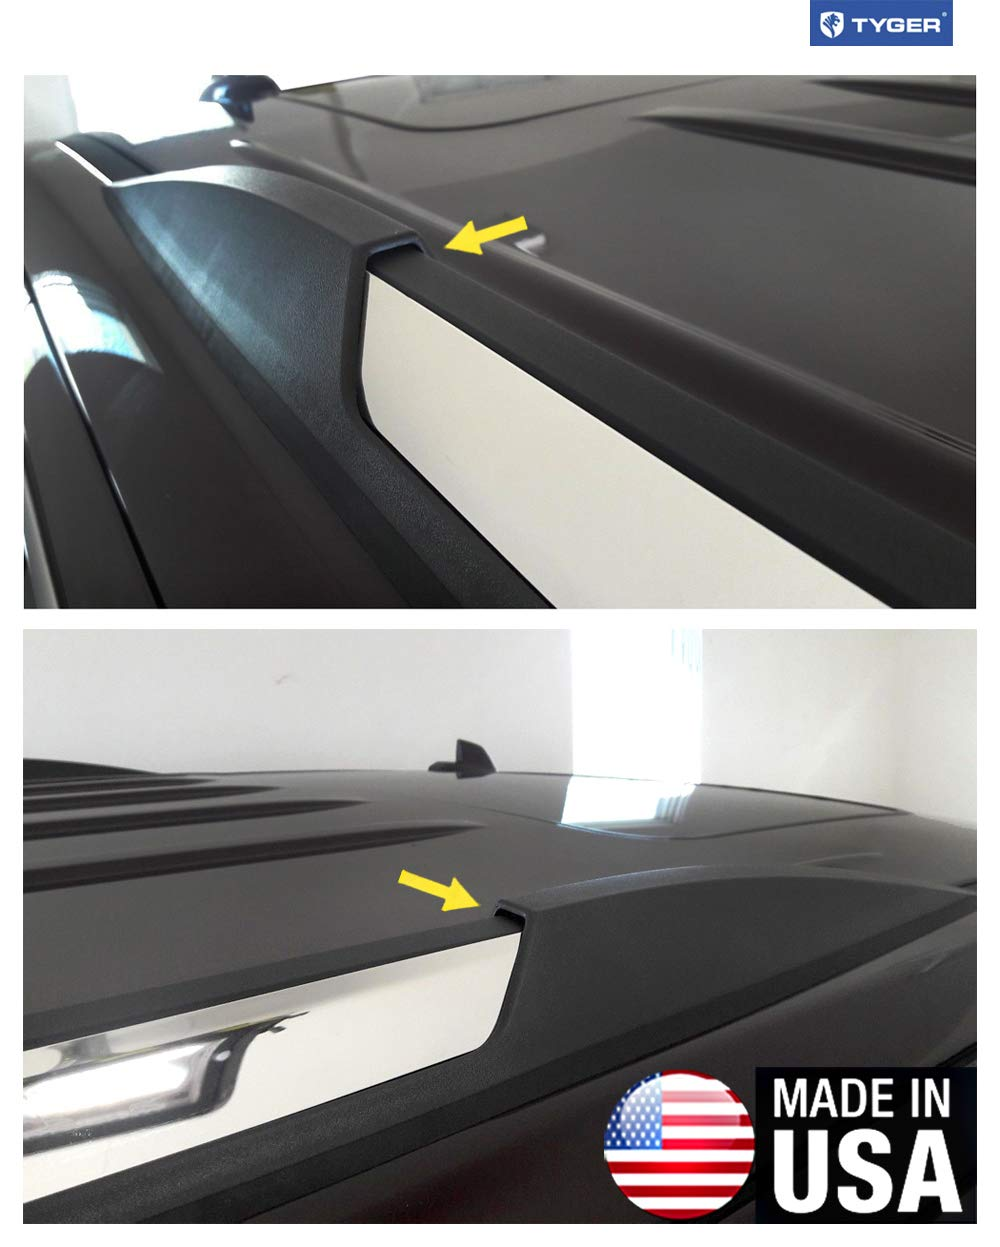 TYGER Fits 2015-2019 Chevy Suburban GMC Yukon XL Roof Rack Body Molding Trim 2PC